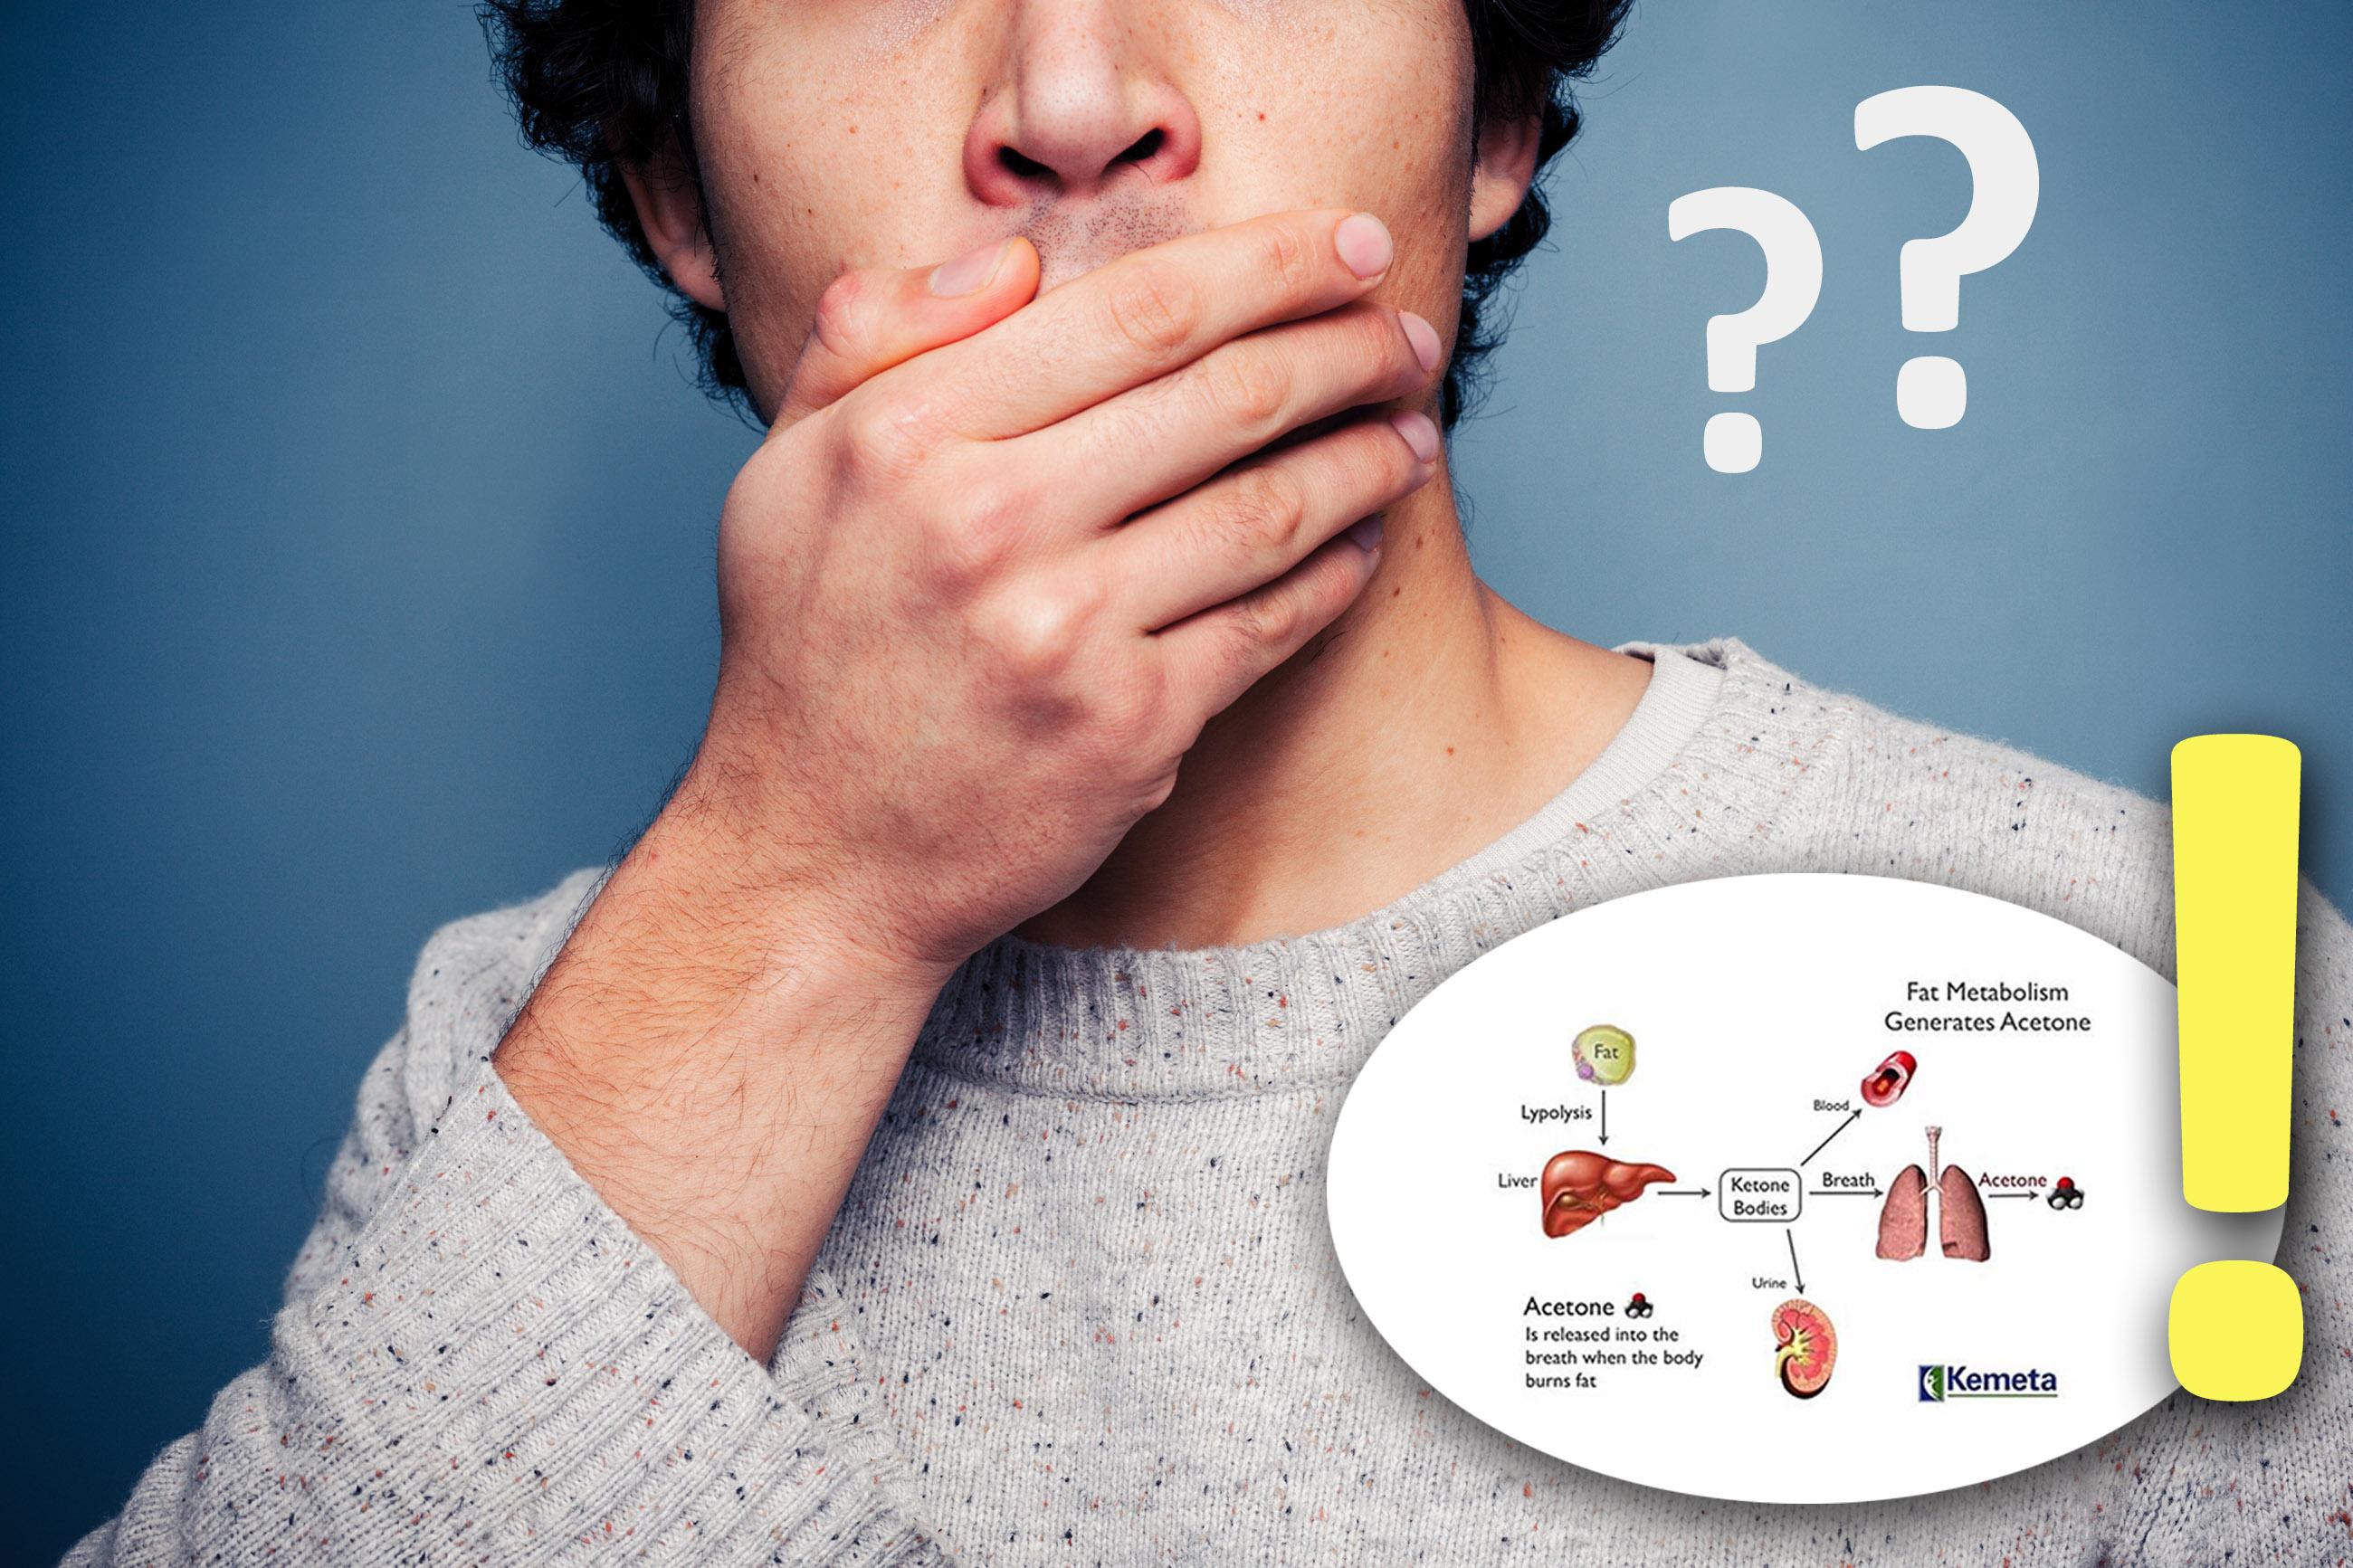 Acetono kvapas iš burnos